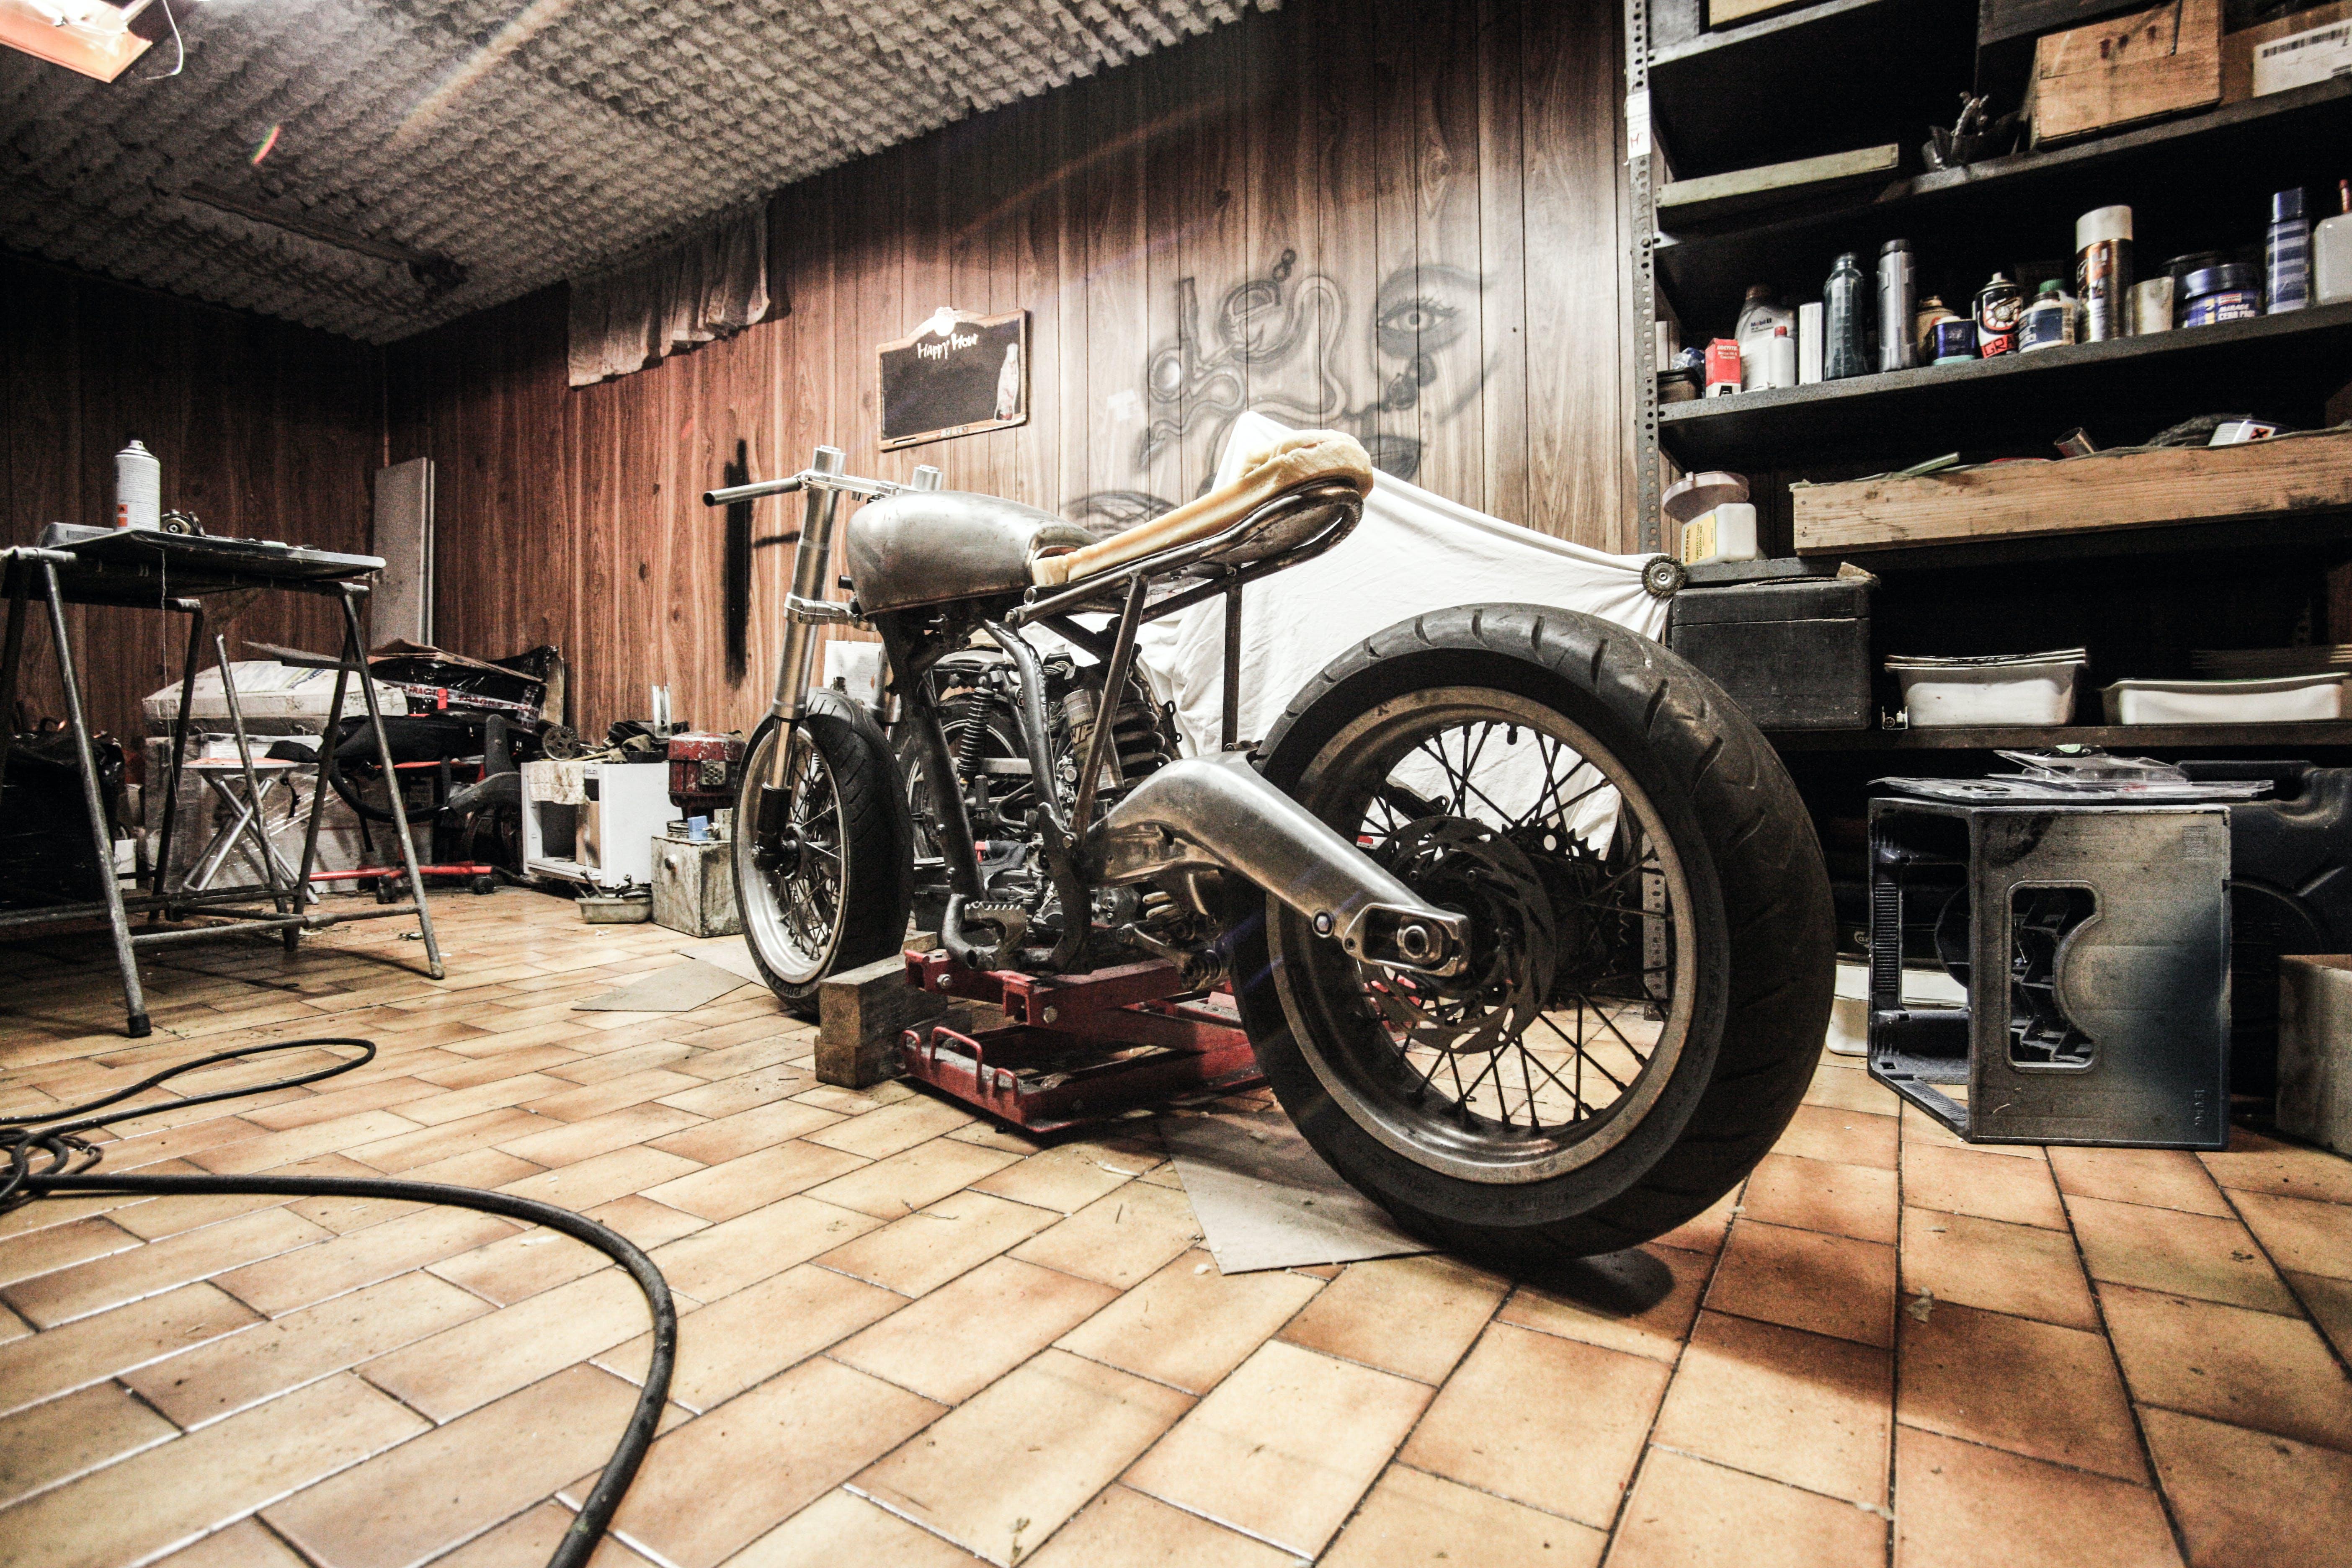 Gray Cruiser Motorcycle